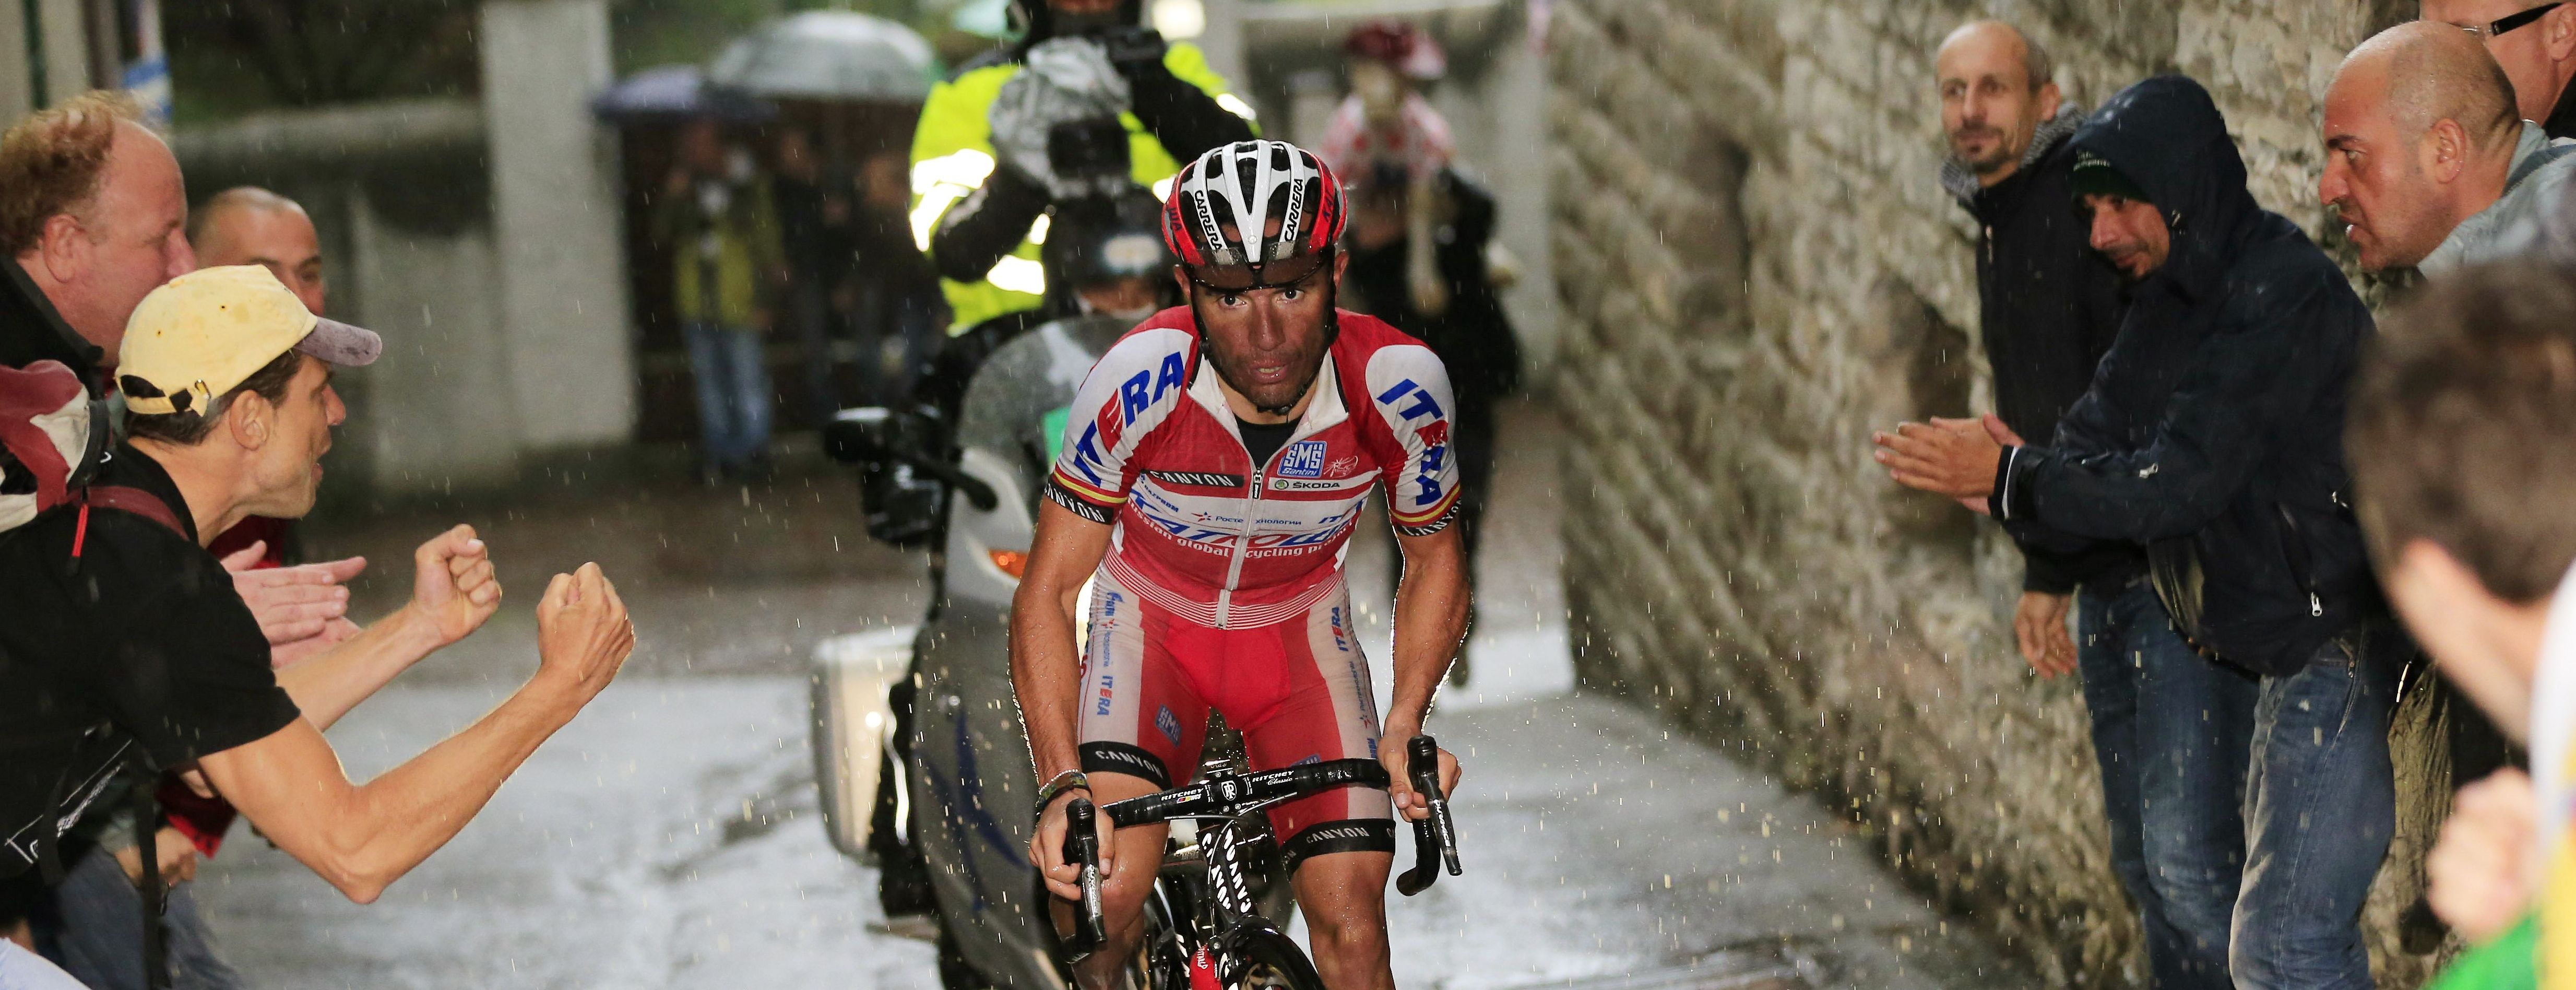 CYCLING-ITA-LOMBARDY